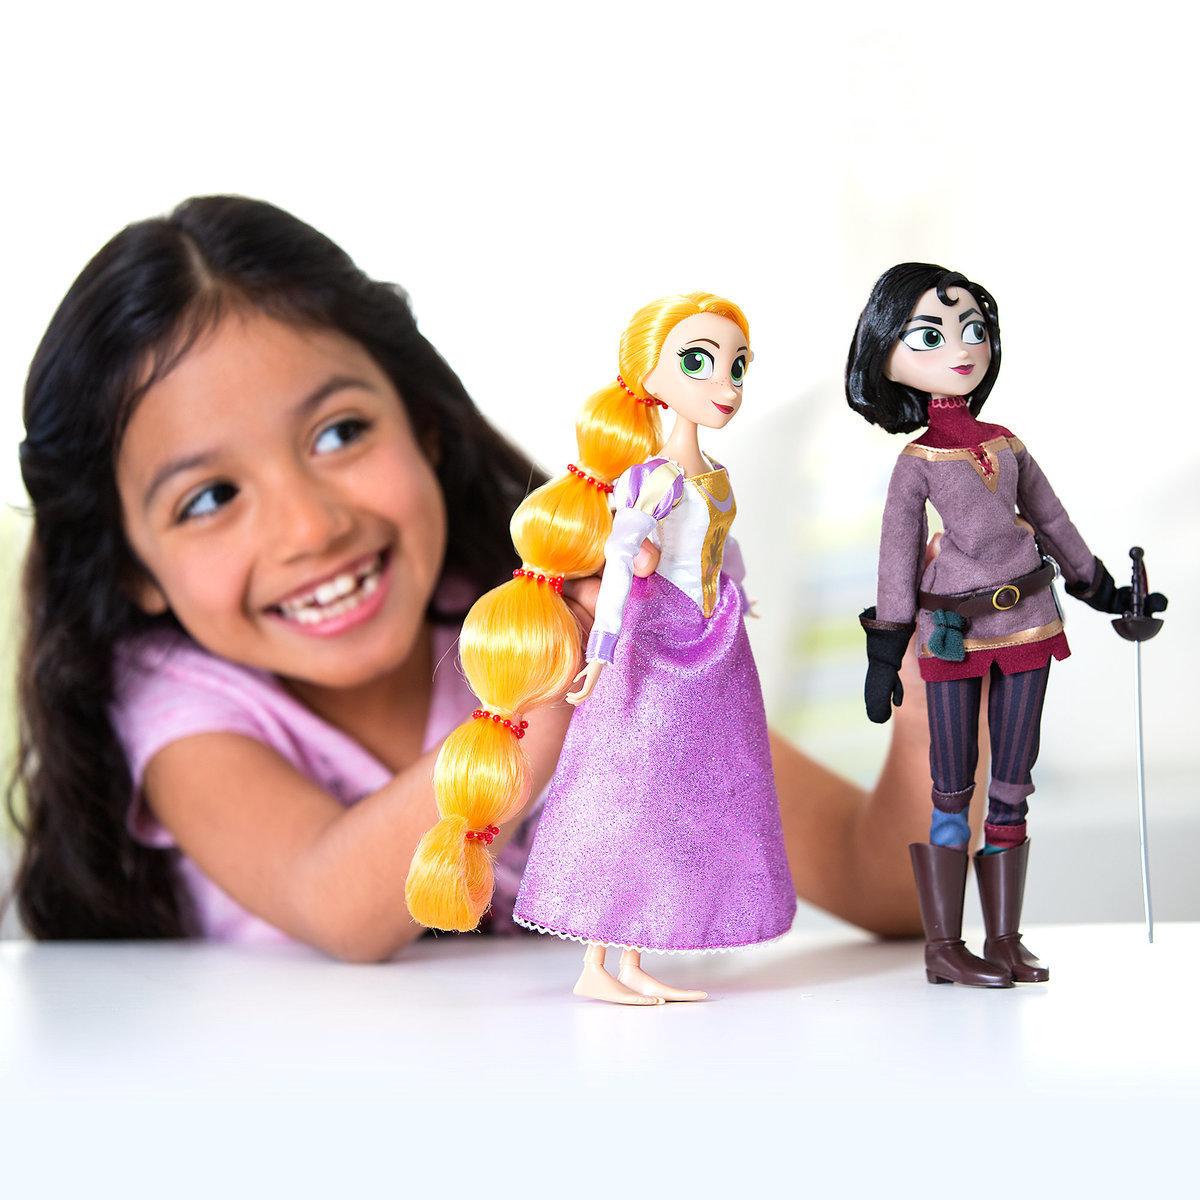 Набор кукол «Рапунцель и Кассандра» - Дисней